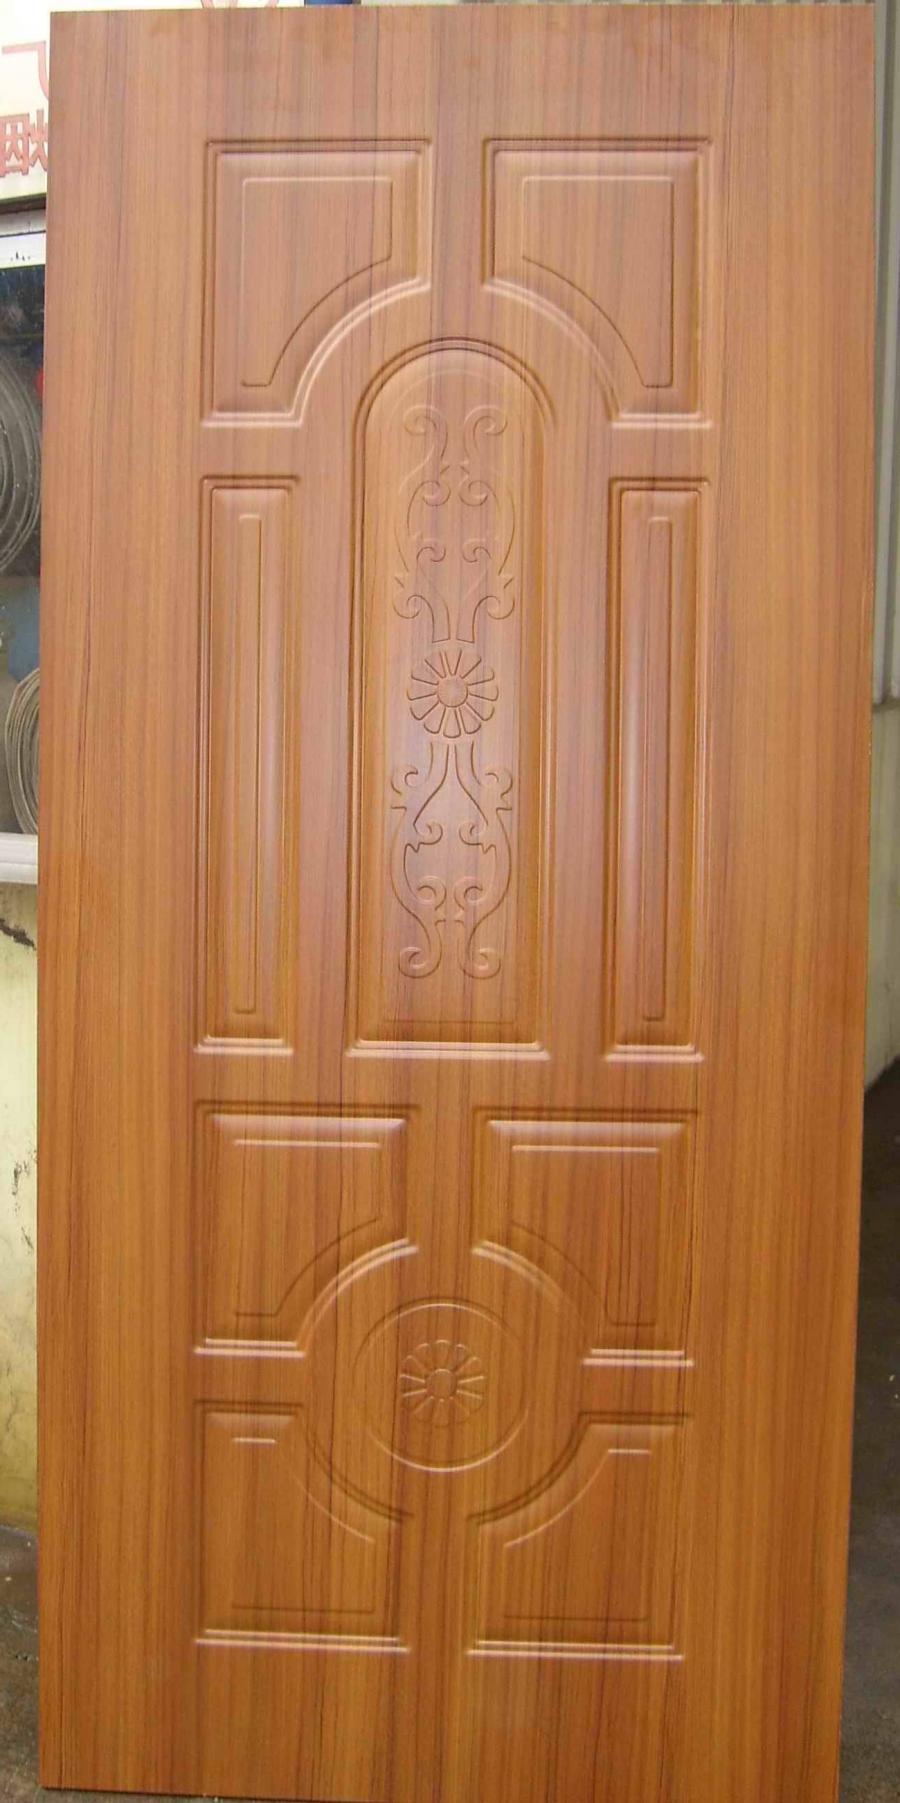 Door Designs Sri Lanka Photo Gallery